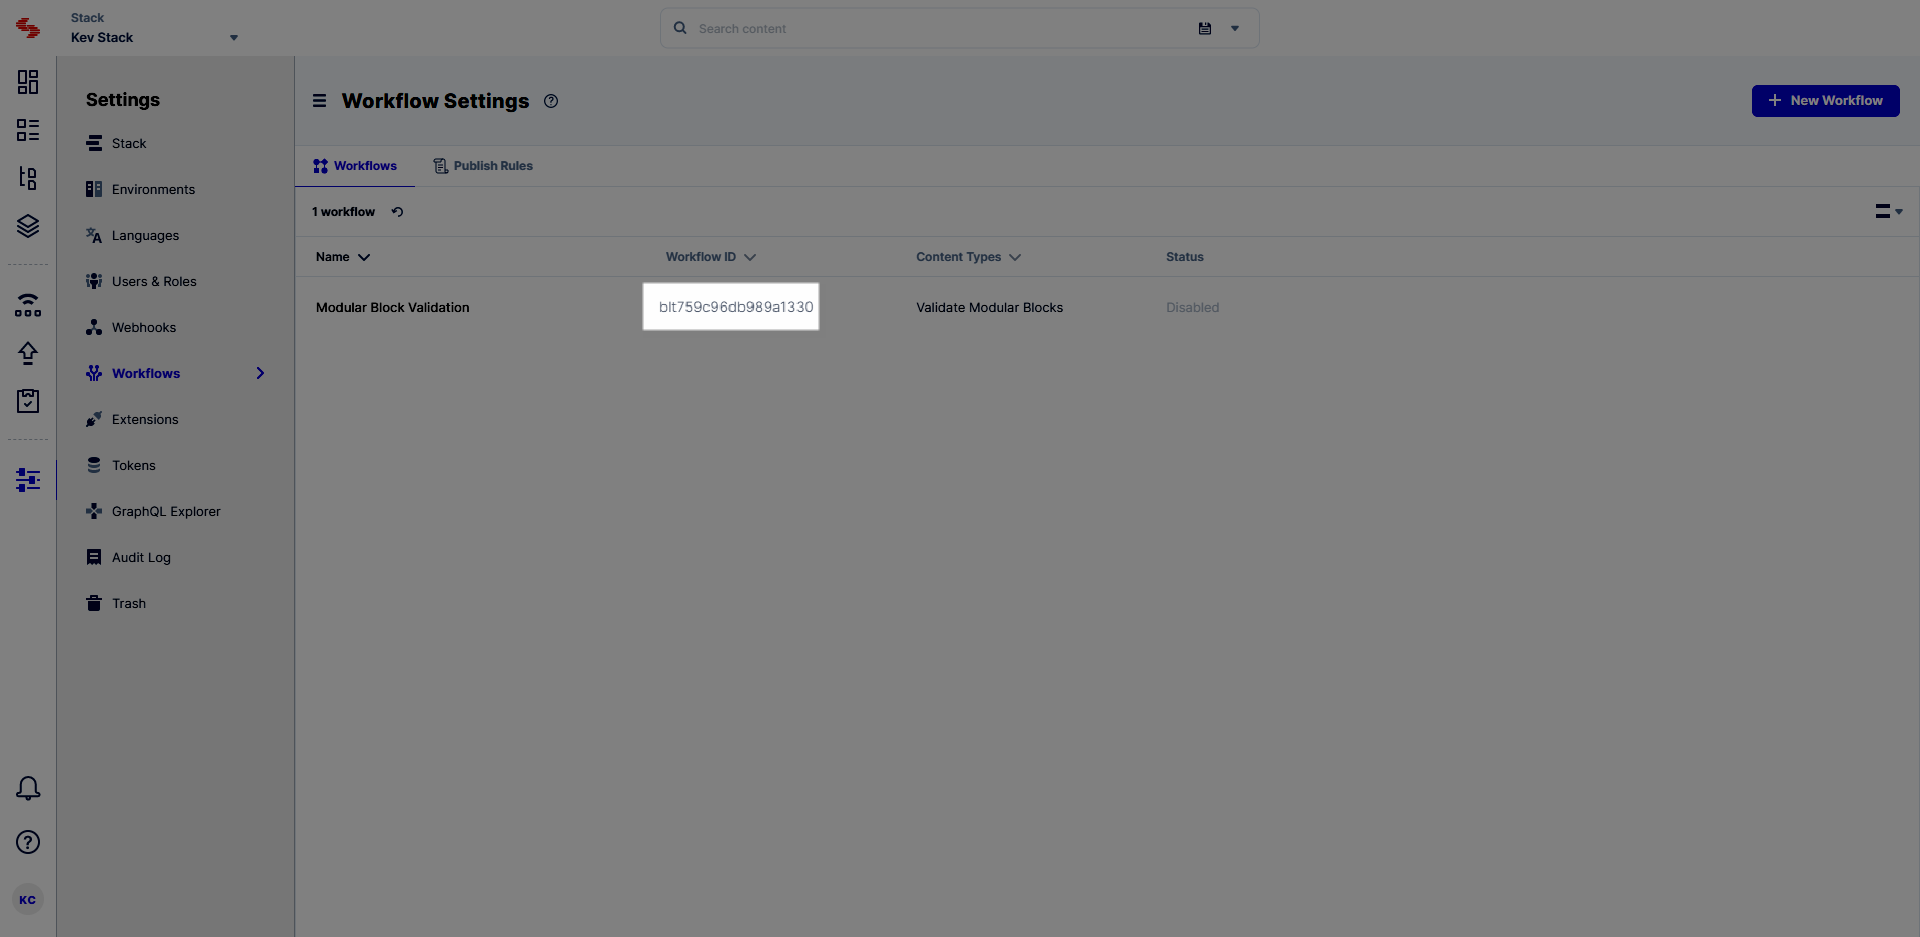 Validating_Modular_Blocks_using_Contentstack_Webhooks_and_AWS_Lambda_6_highlighted.png